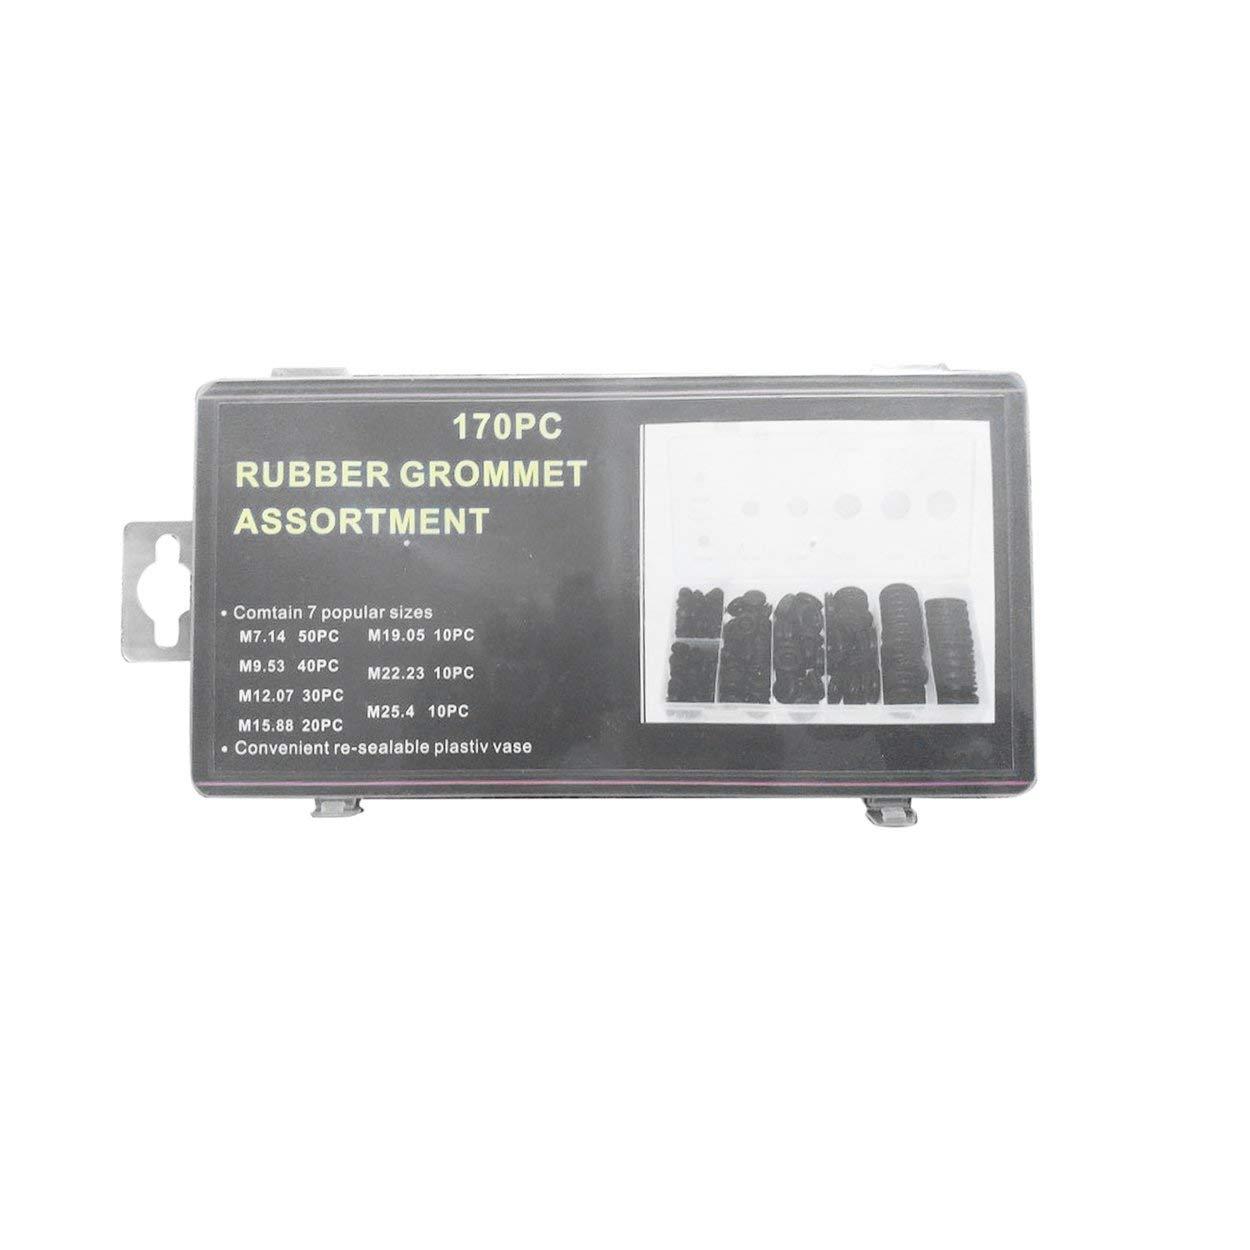 Lorenlli 170Pcs Rubber Grommet Assortment Contain 7 Popular Sizes Firewall Hole Plug Set Electrical Wire Gasket Kit For Car